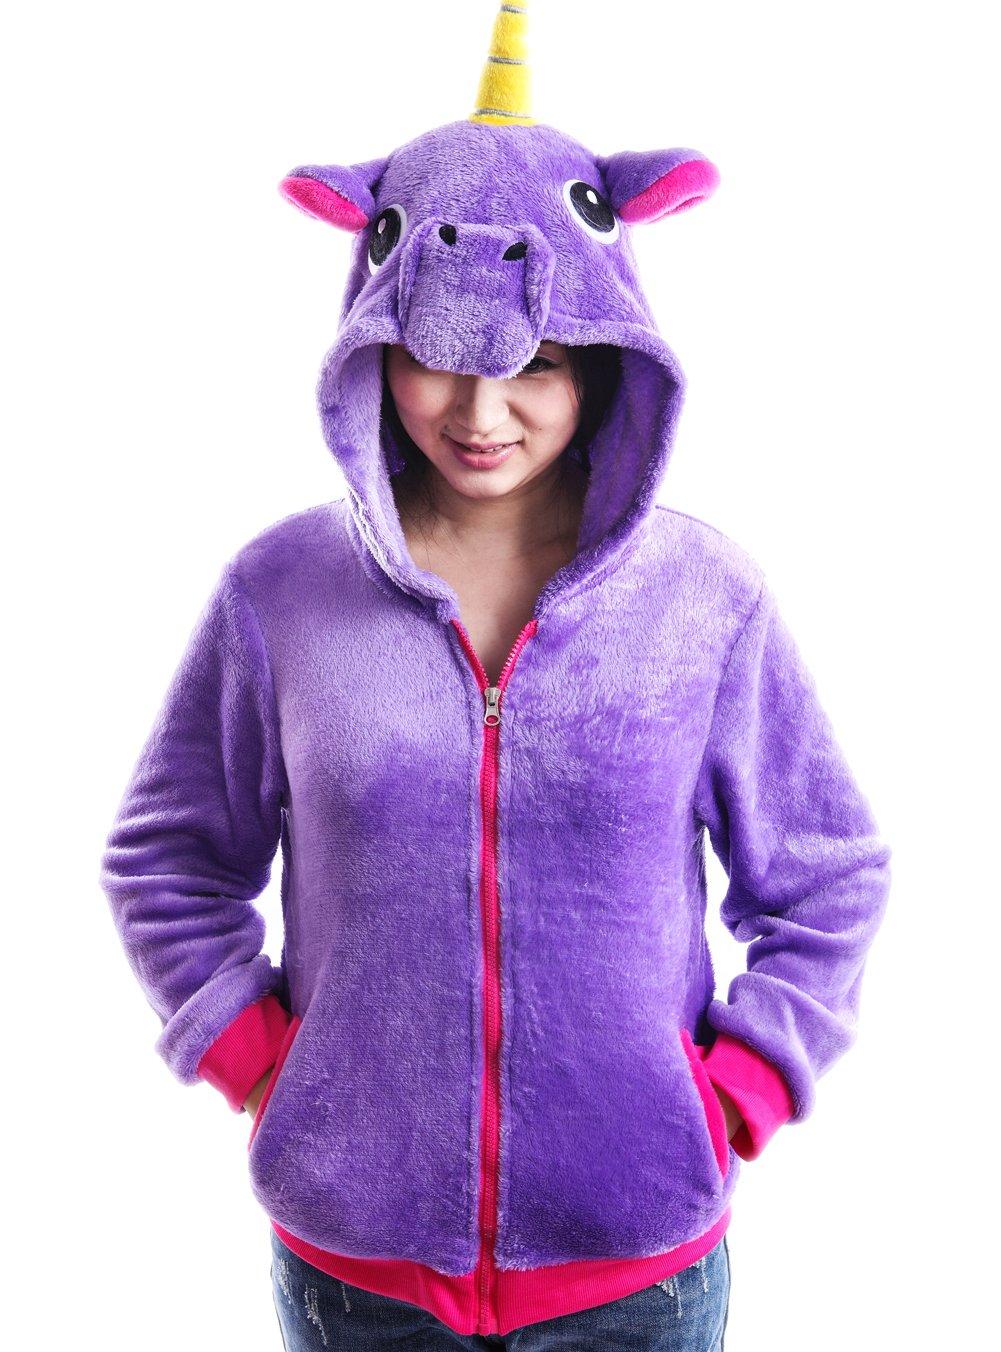 AooToo Costume Hoodies Cute Juniors Kids Cartoon Animal Flannel Zipper Jackets(Purple, S(7))